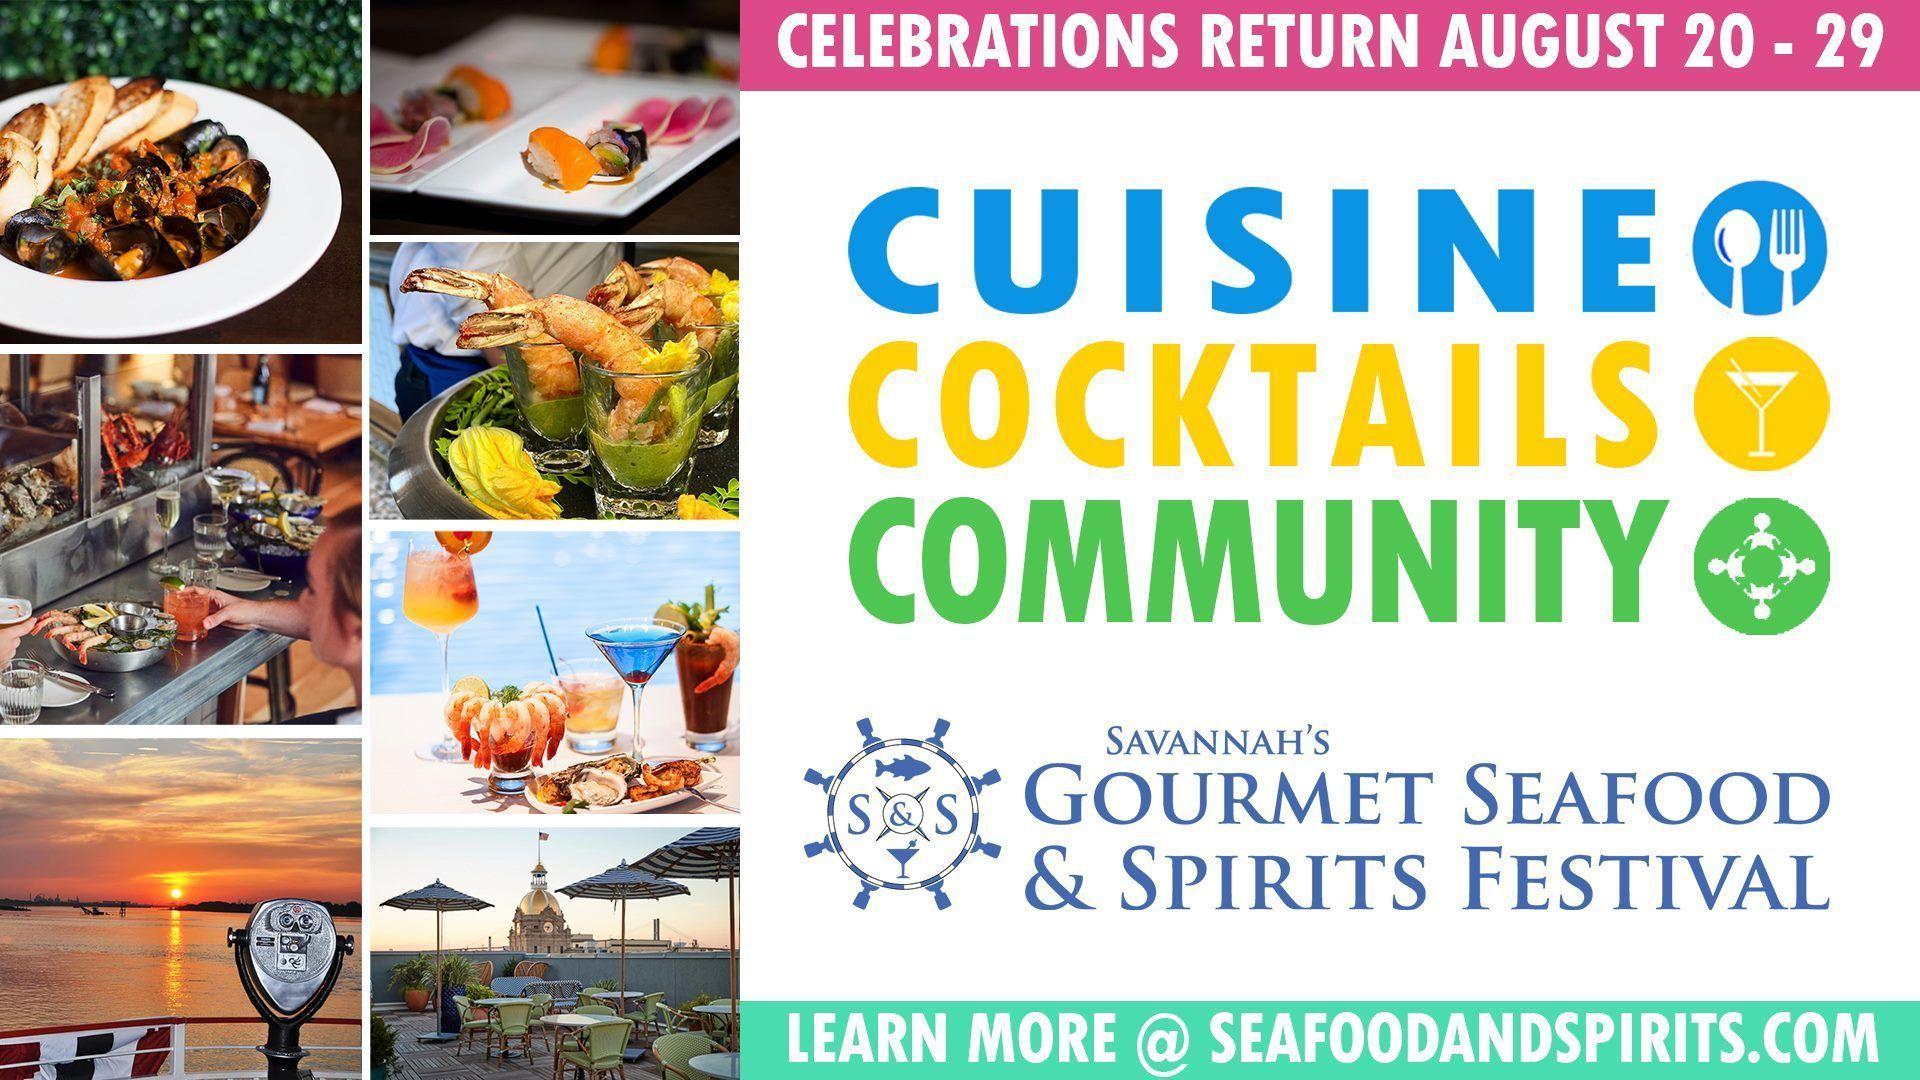 Savannah's Gourmet Seafood & Spirits Fesival